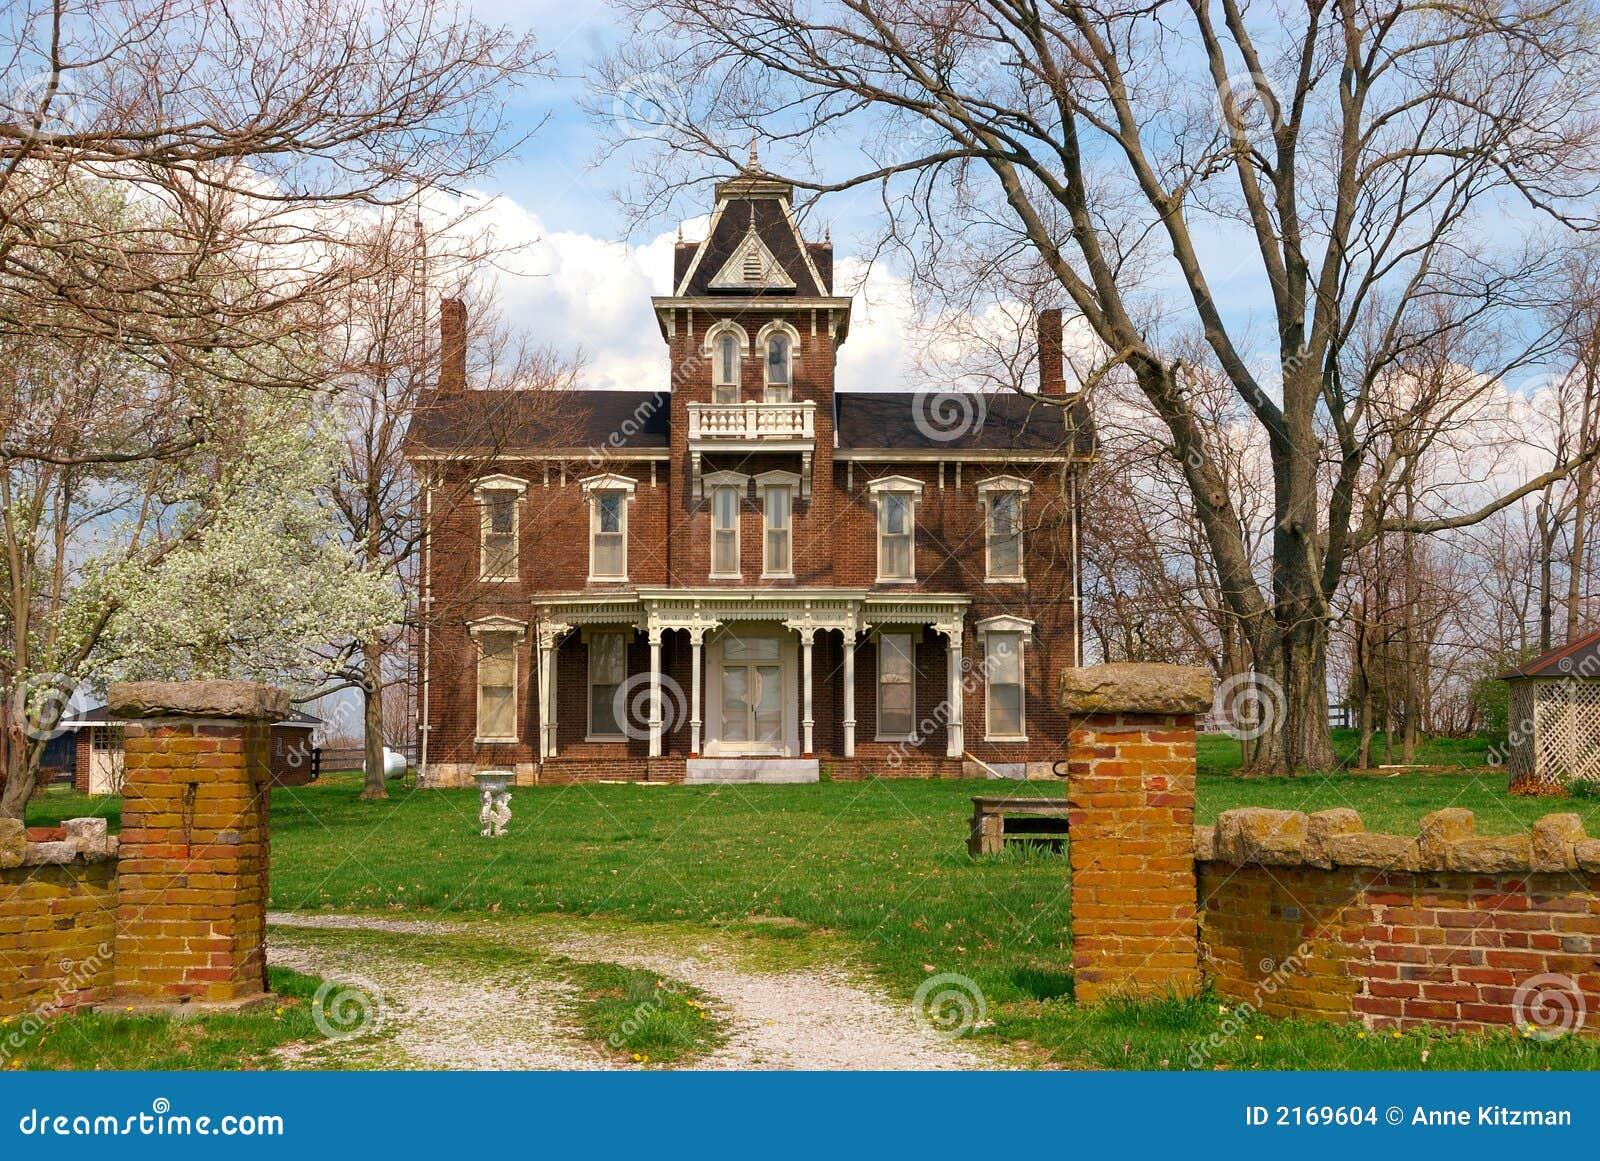 Historic 1800s Brick Home Stock Image